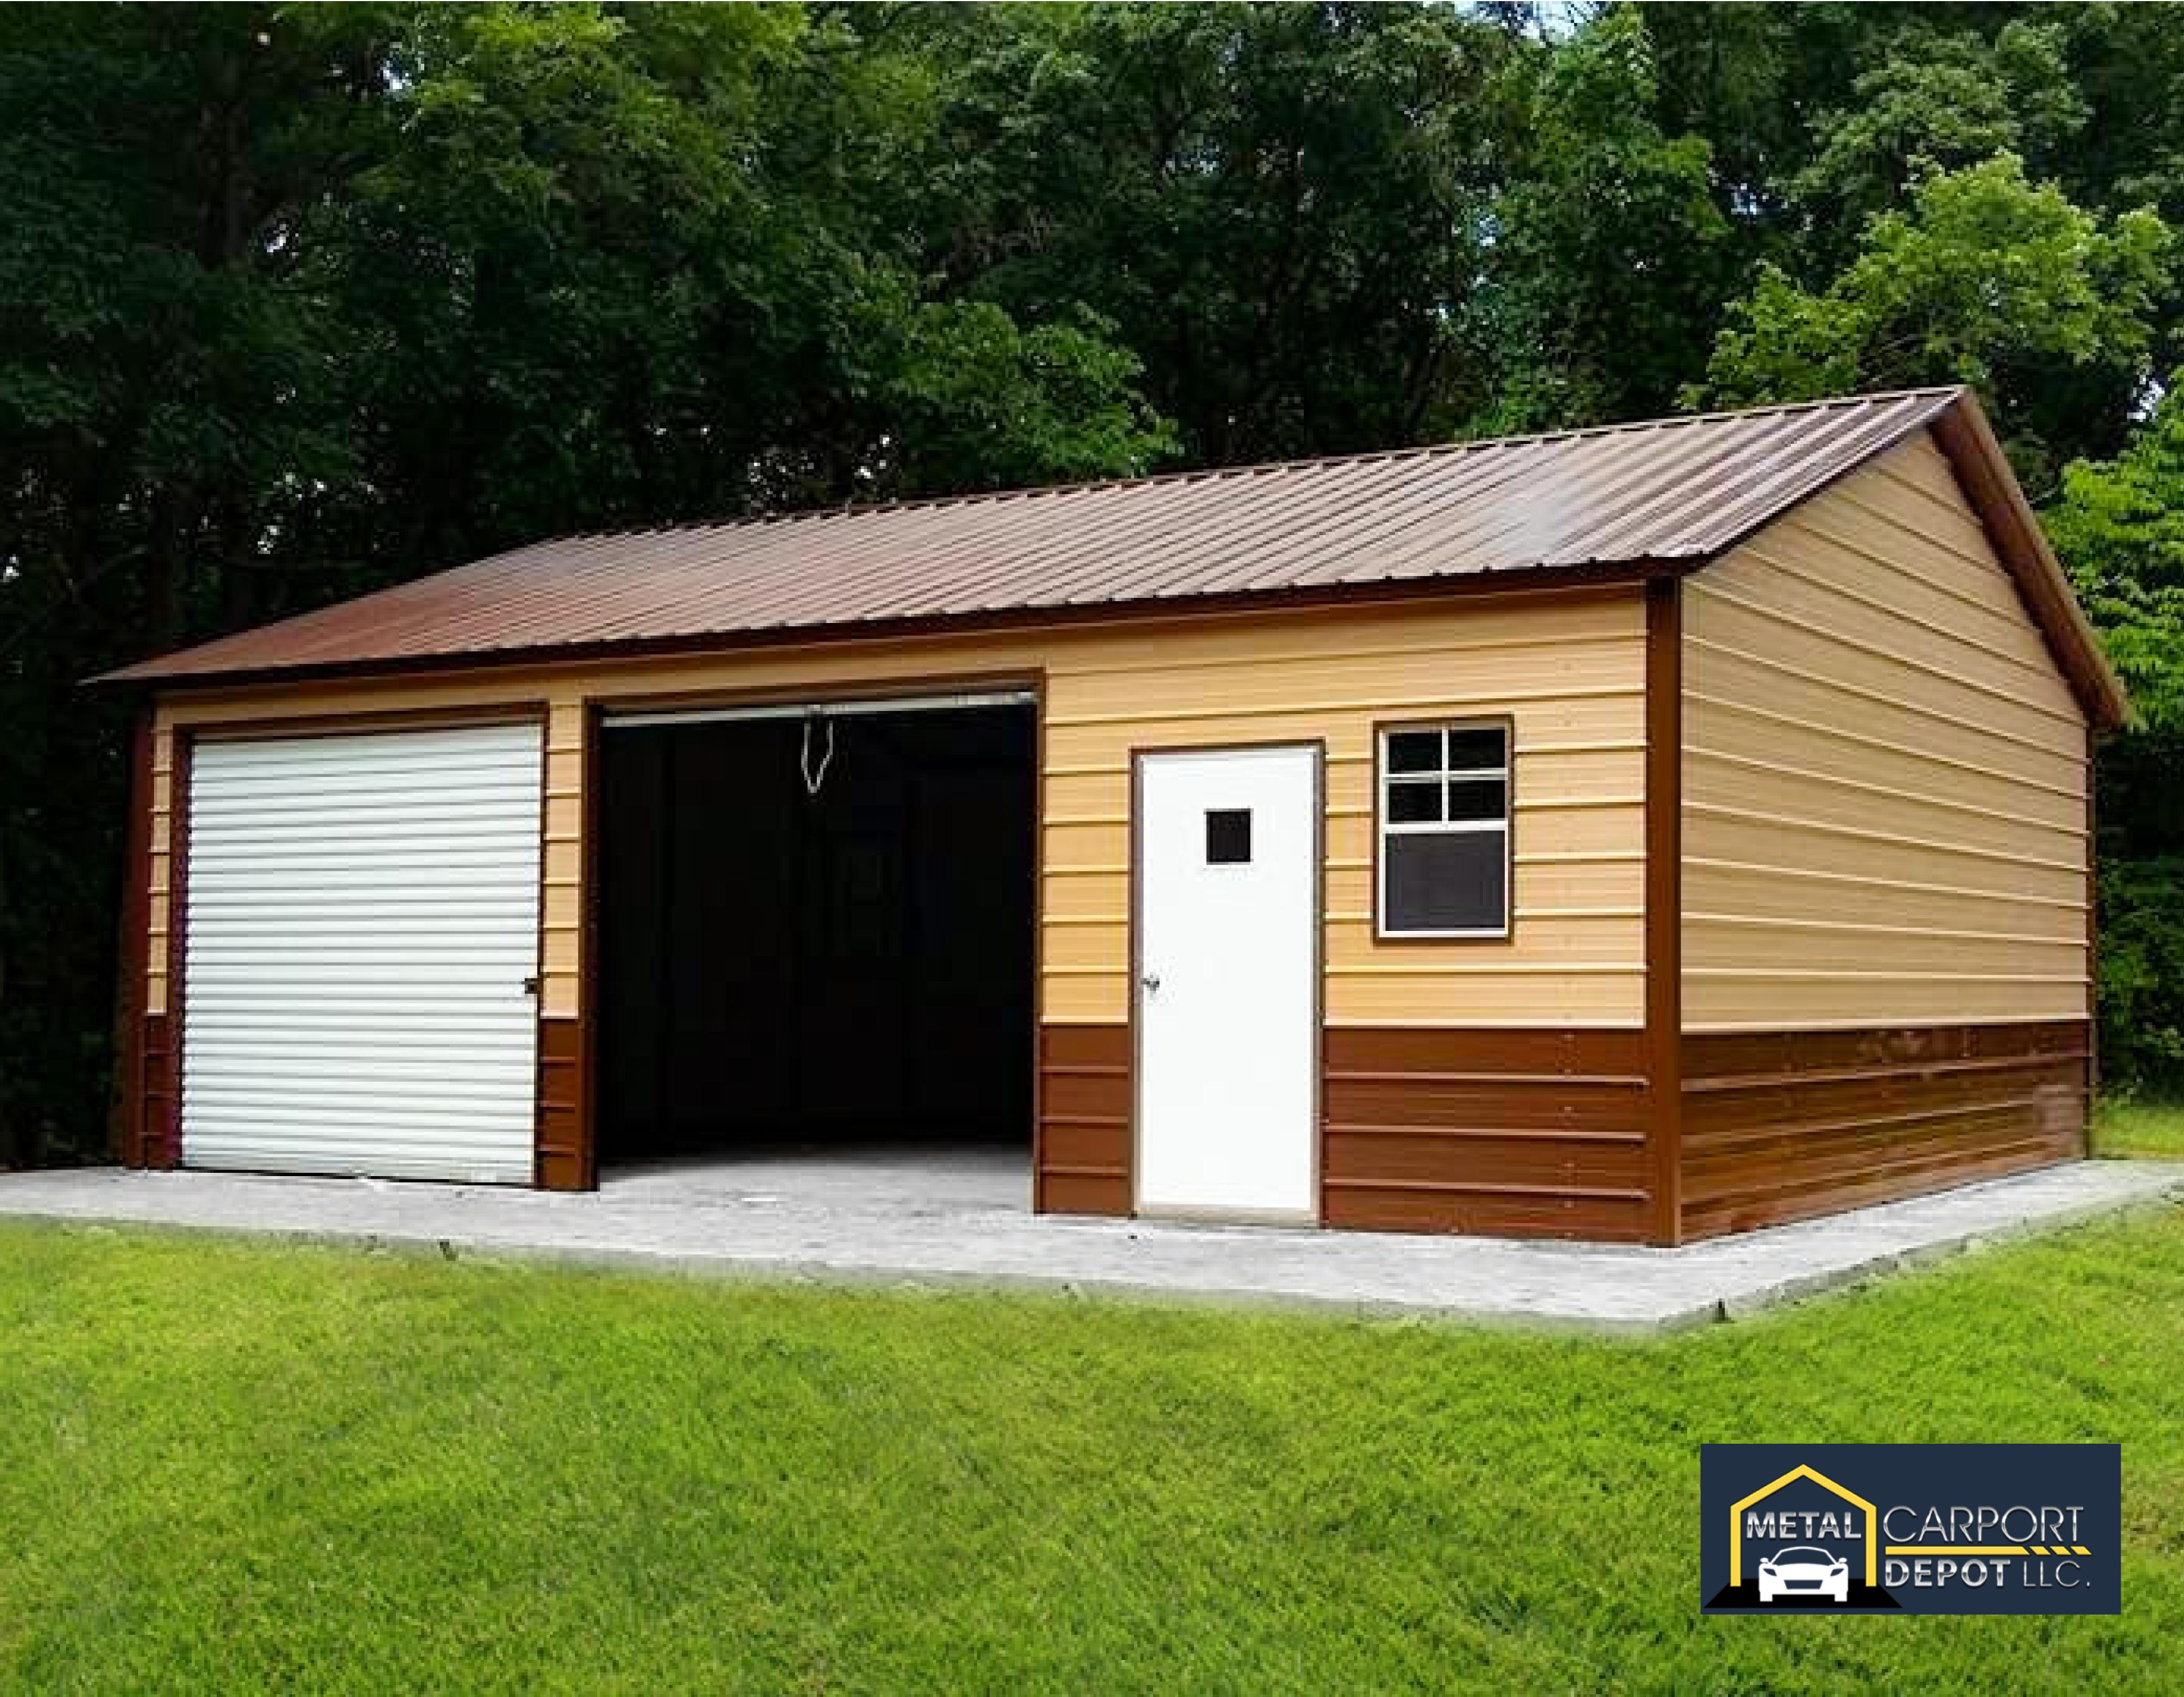 24' x 30' Metal Side Entry Garage in 2020 Barn house